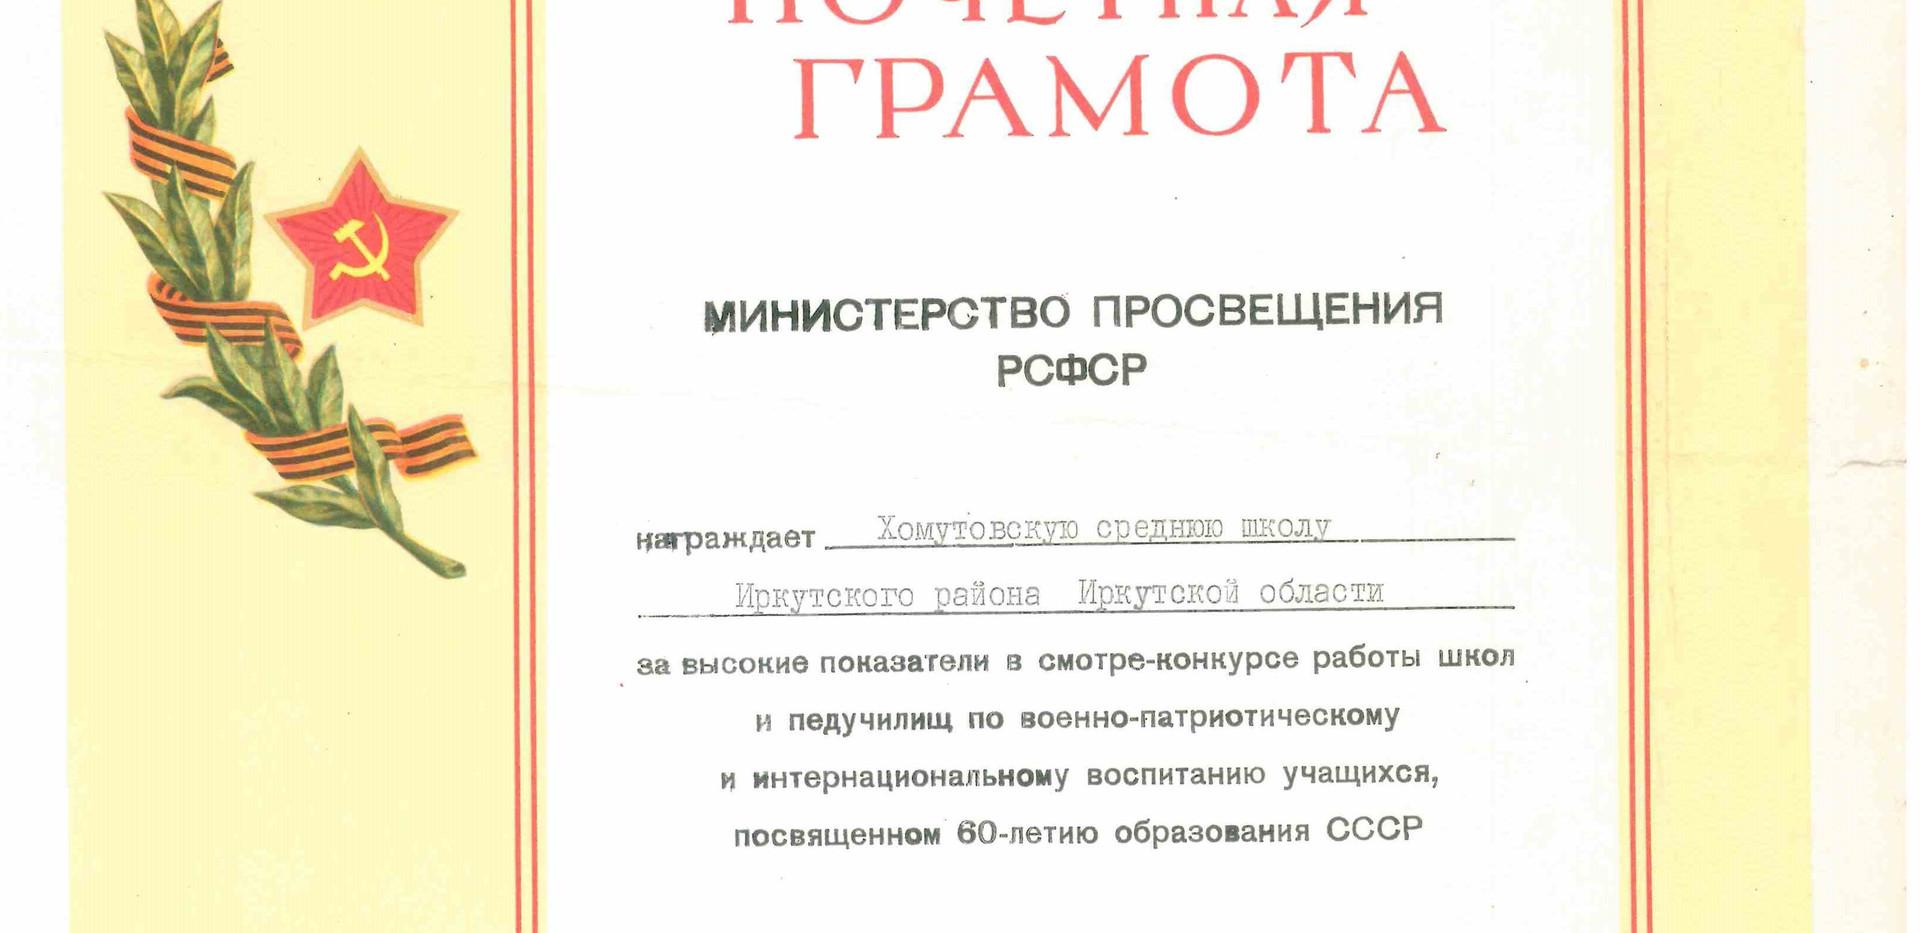 Награды история (3).jpg